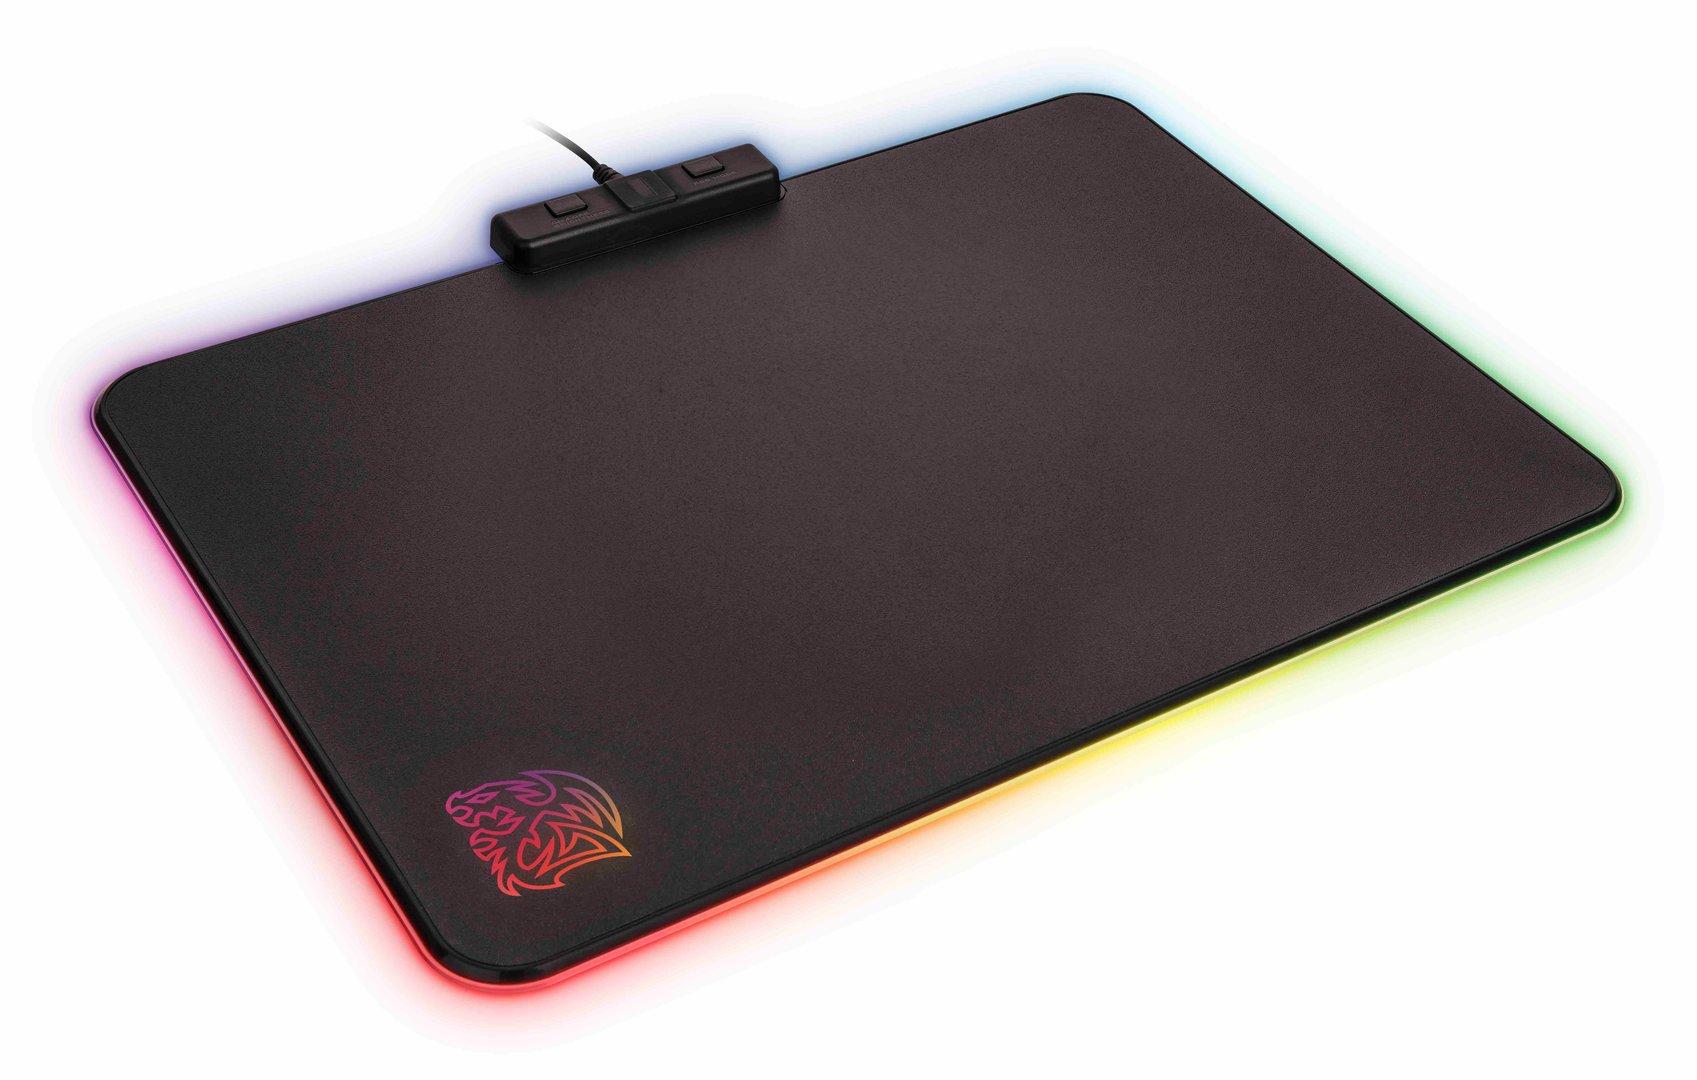 Tt eSports Draconem RGB Touch Edition